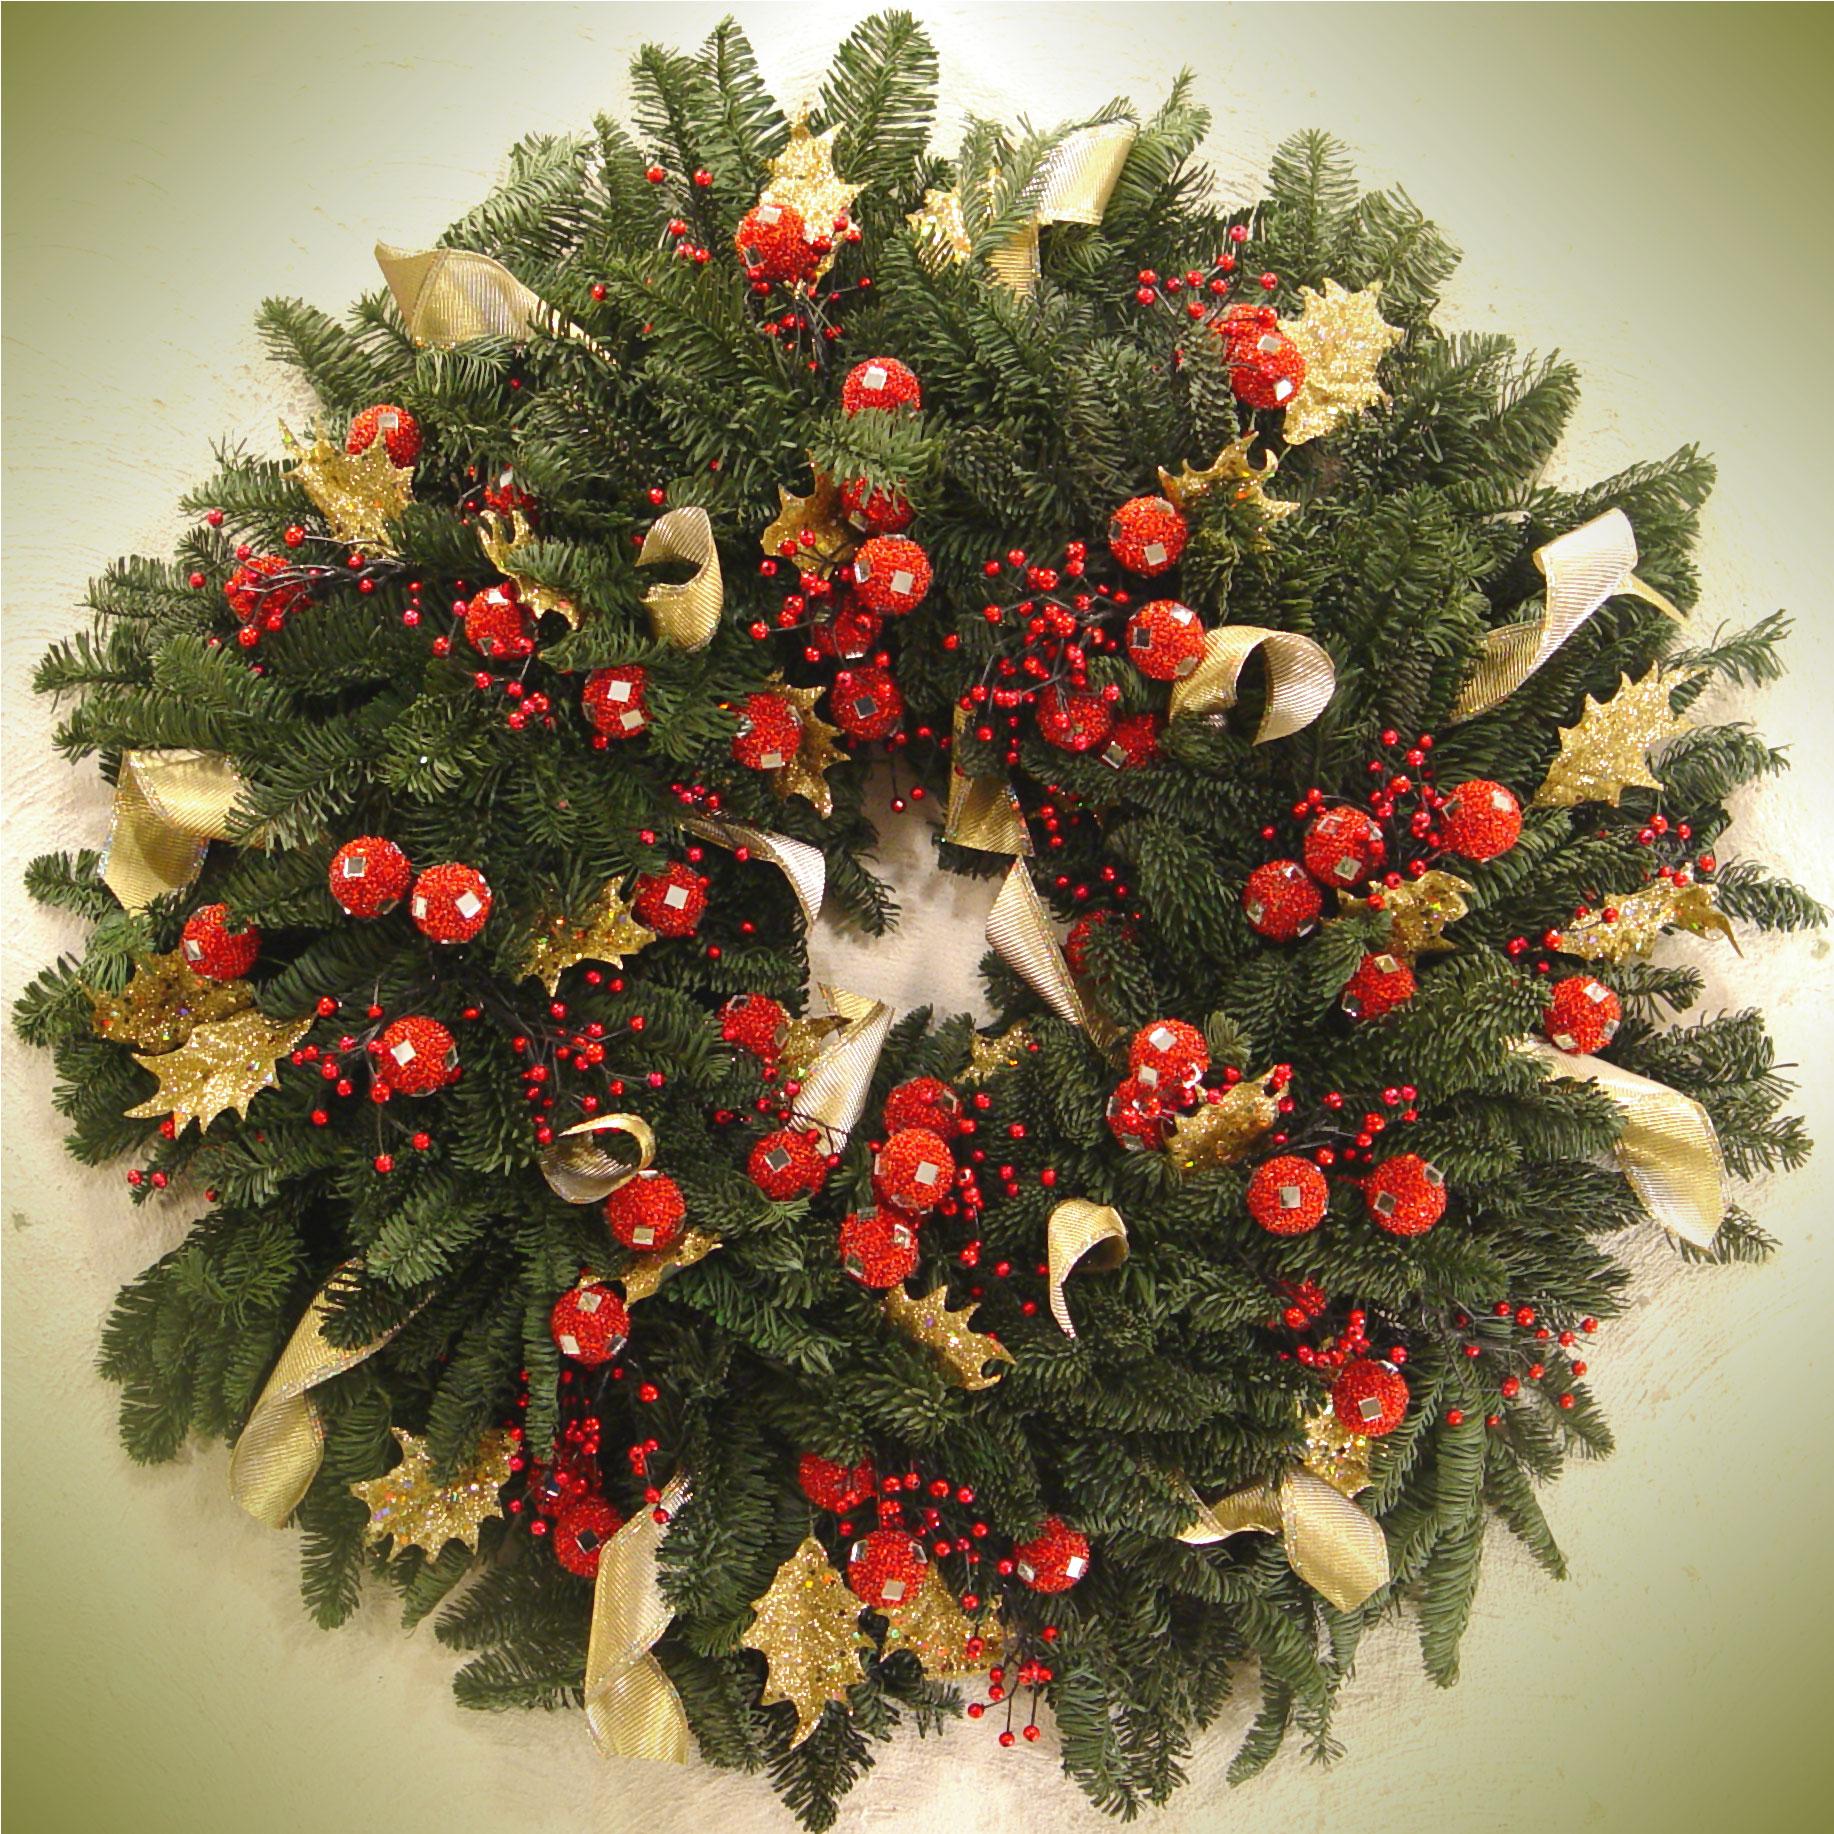 Christmas Decoration Ideas Drawing Free Image